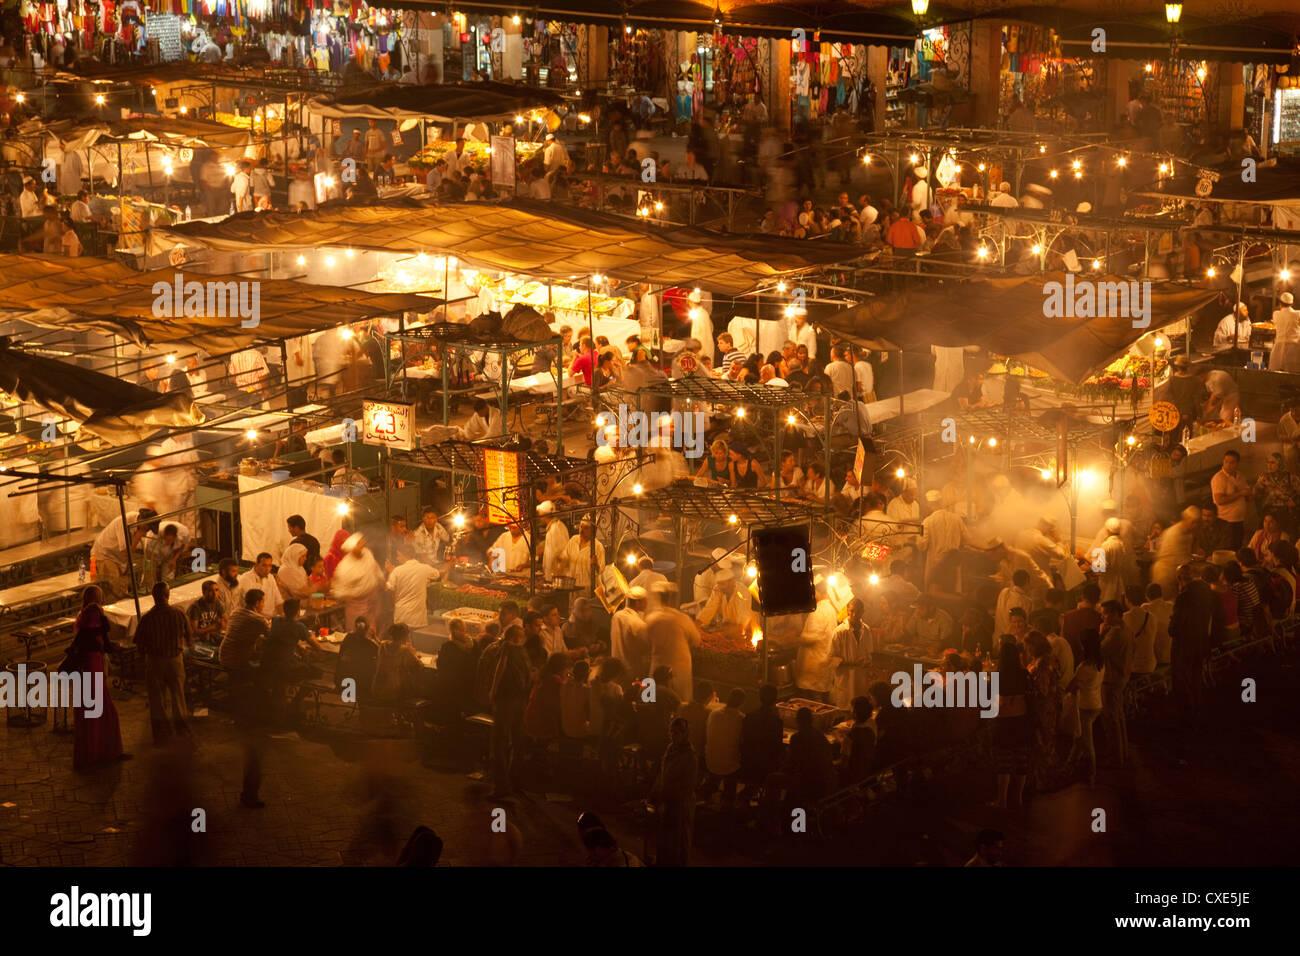 Mercato alimentare in Djemaa el Fna a Marrakech, Marocco, Africa Settentrionale, Africa Foto Stock